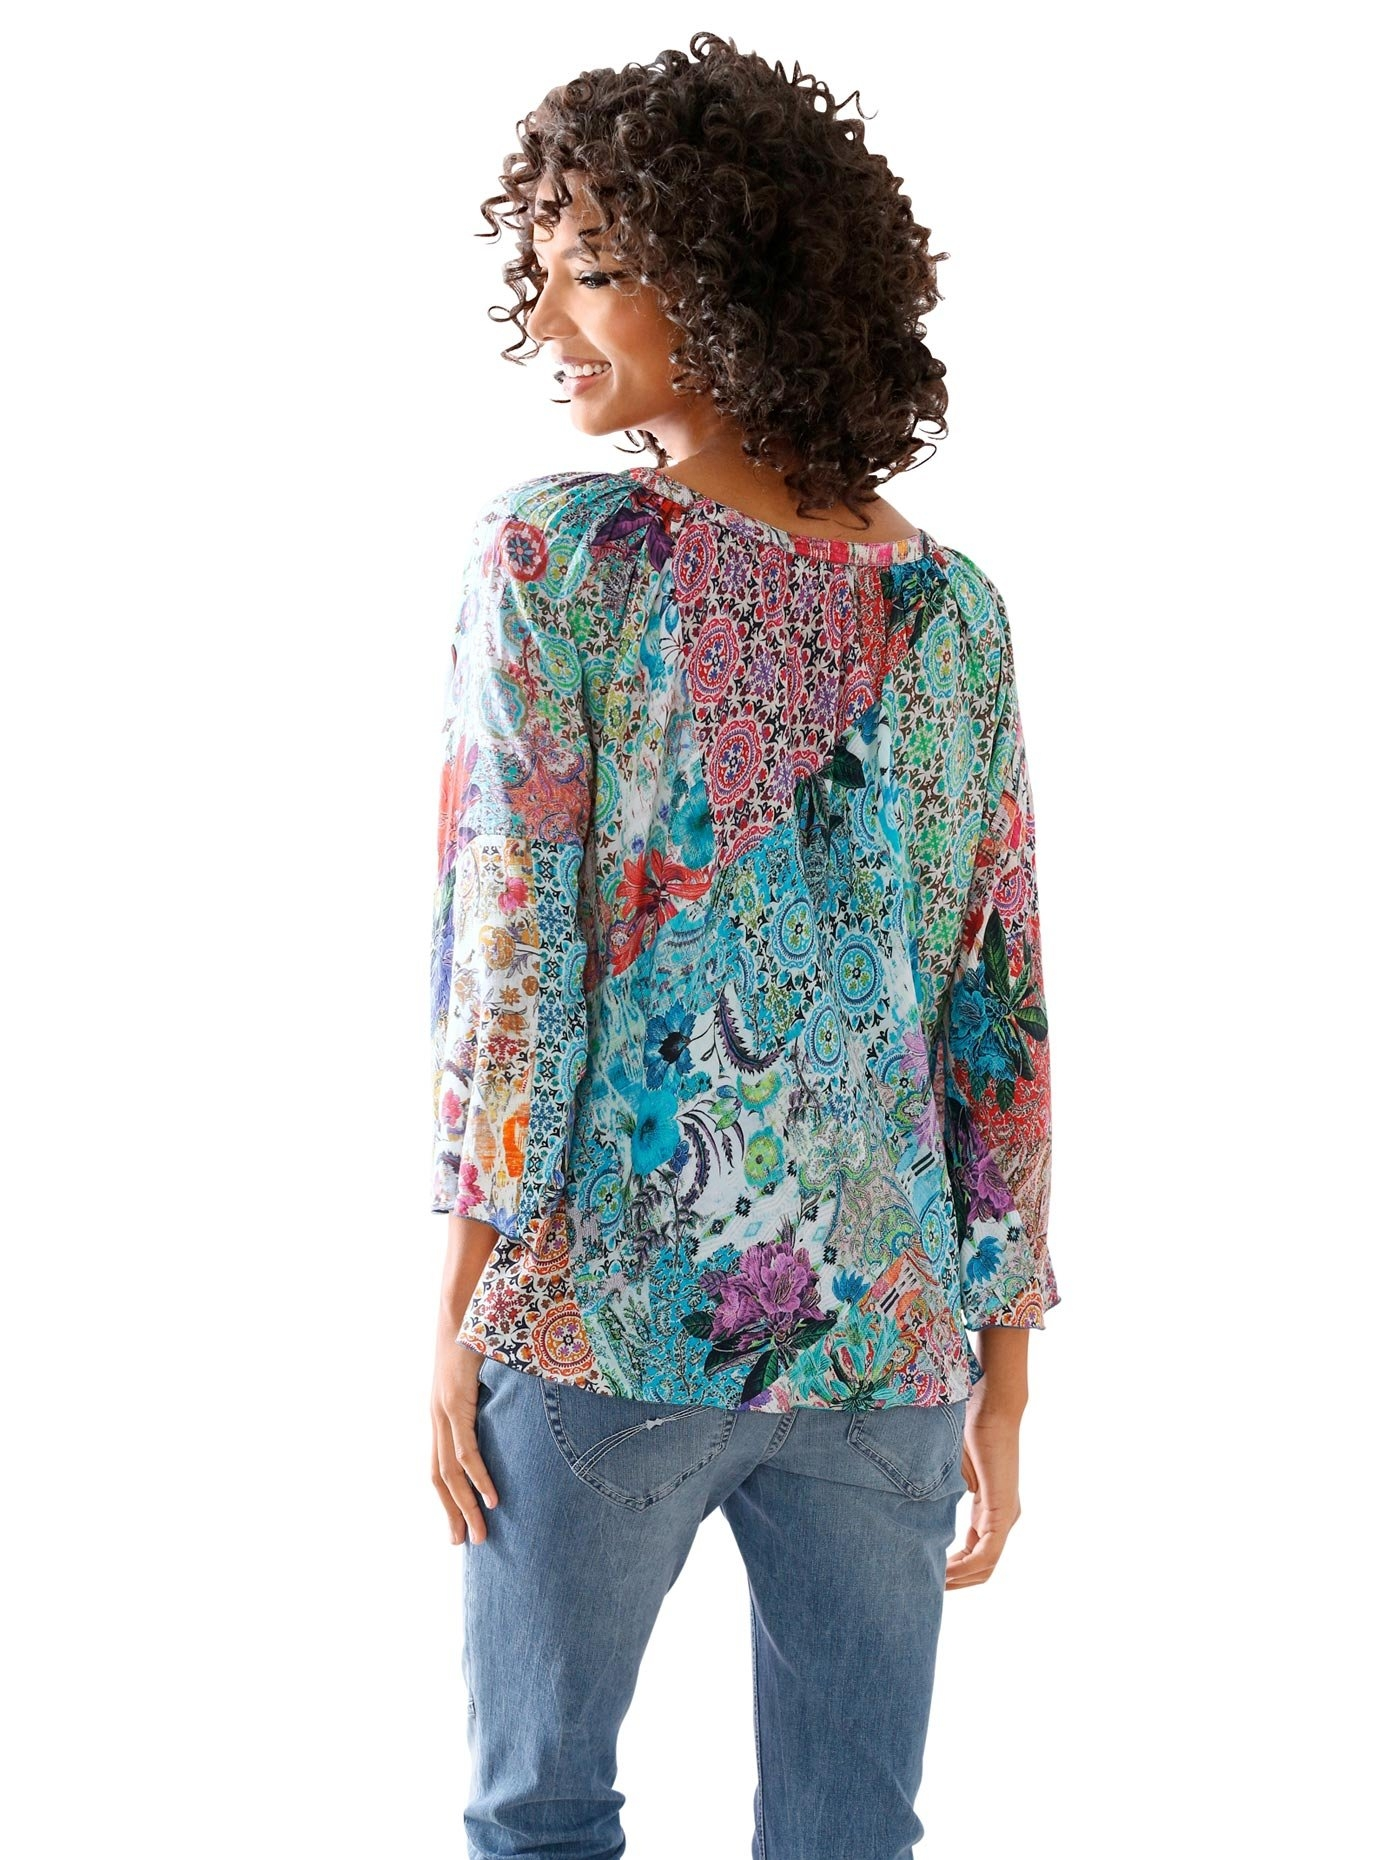 LINEA TESINI by Heine gedessineerde blouse om te strikken - verschillende betaalmethodes